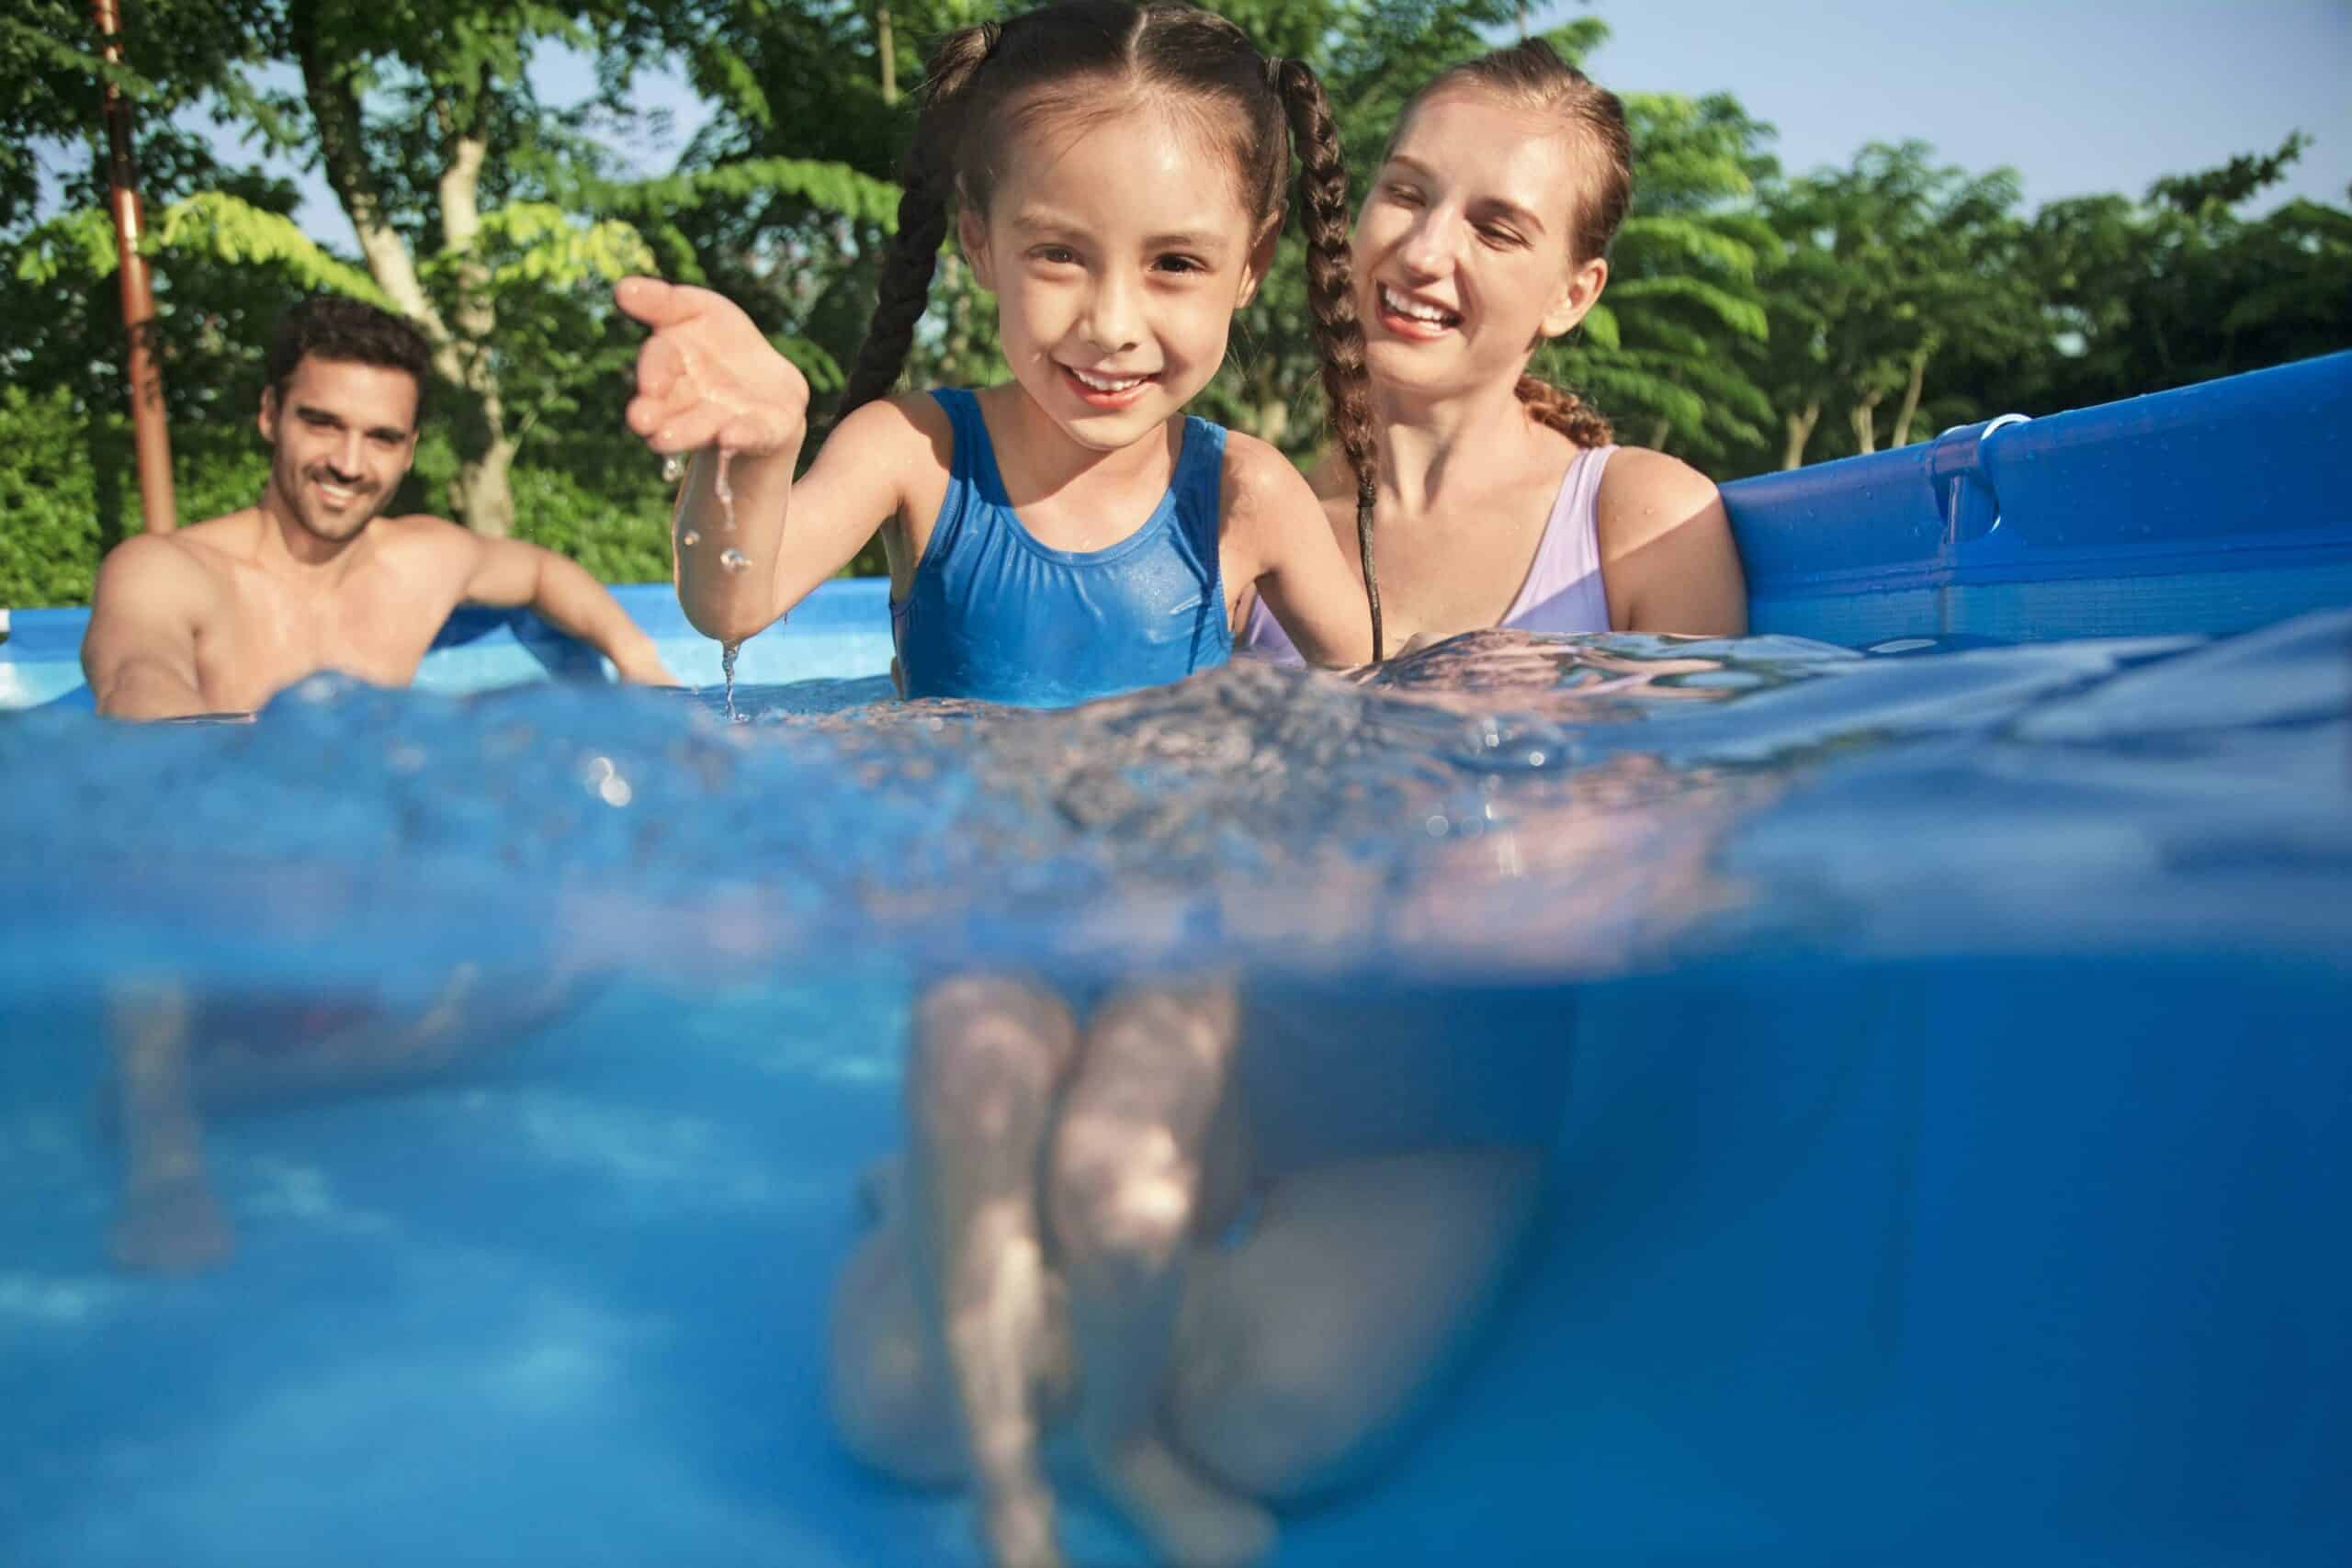 Rektangulært basseng bestway god pris barn